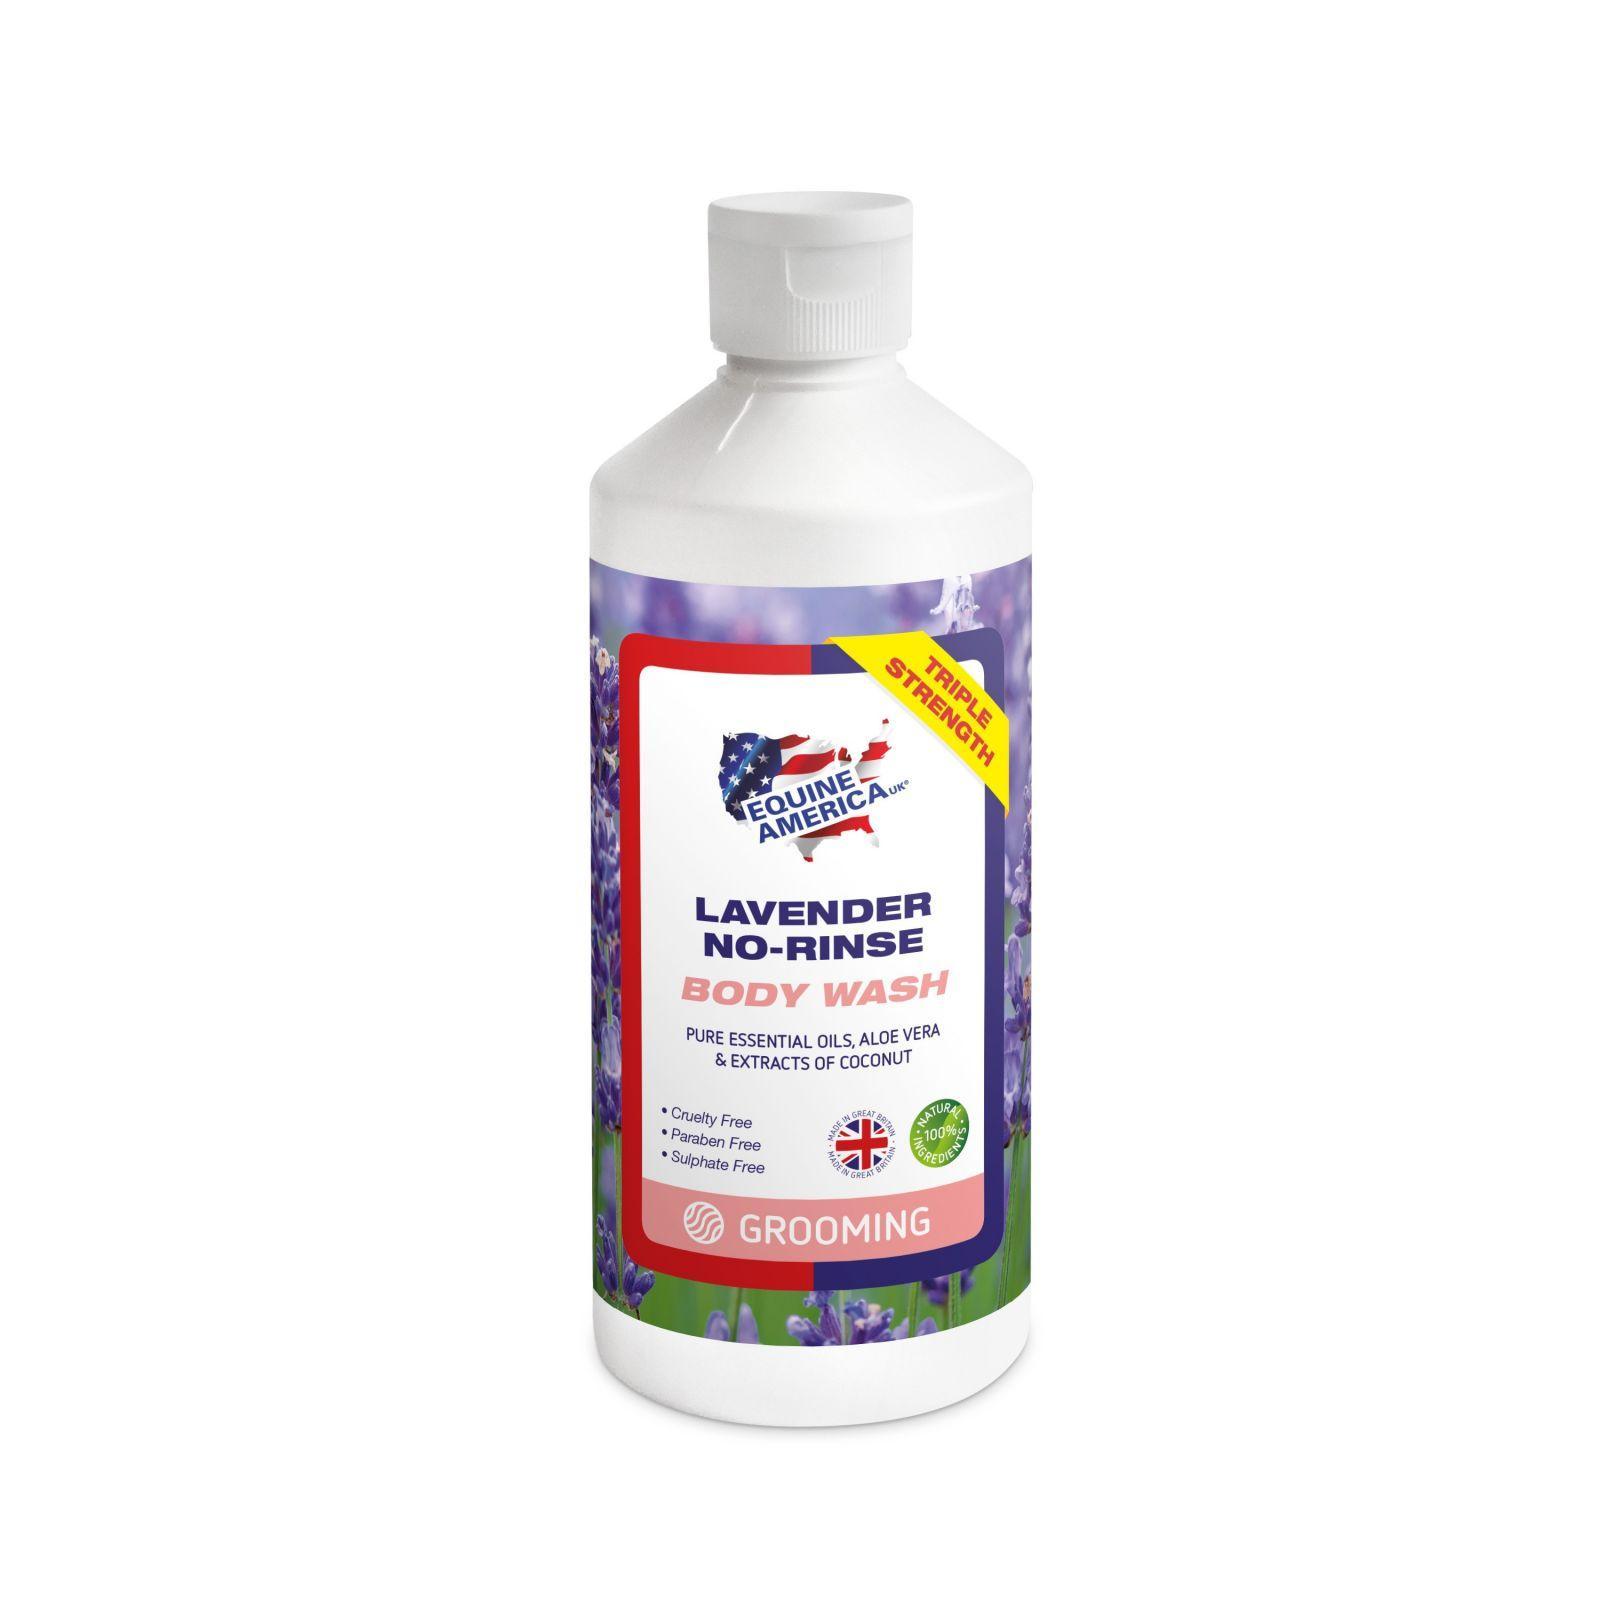 Lavender No Rinse Body Wash